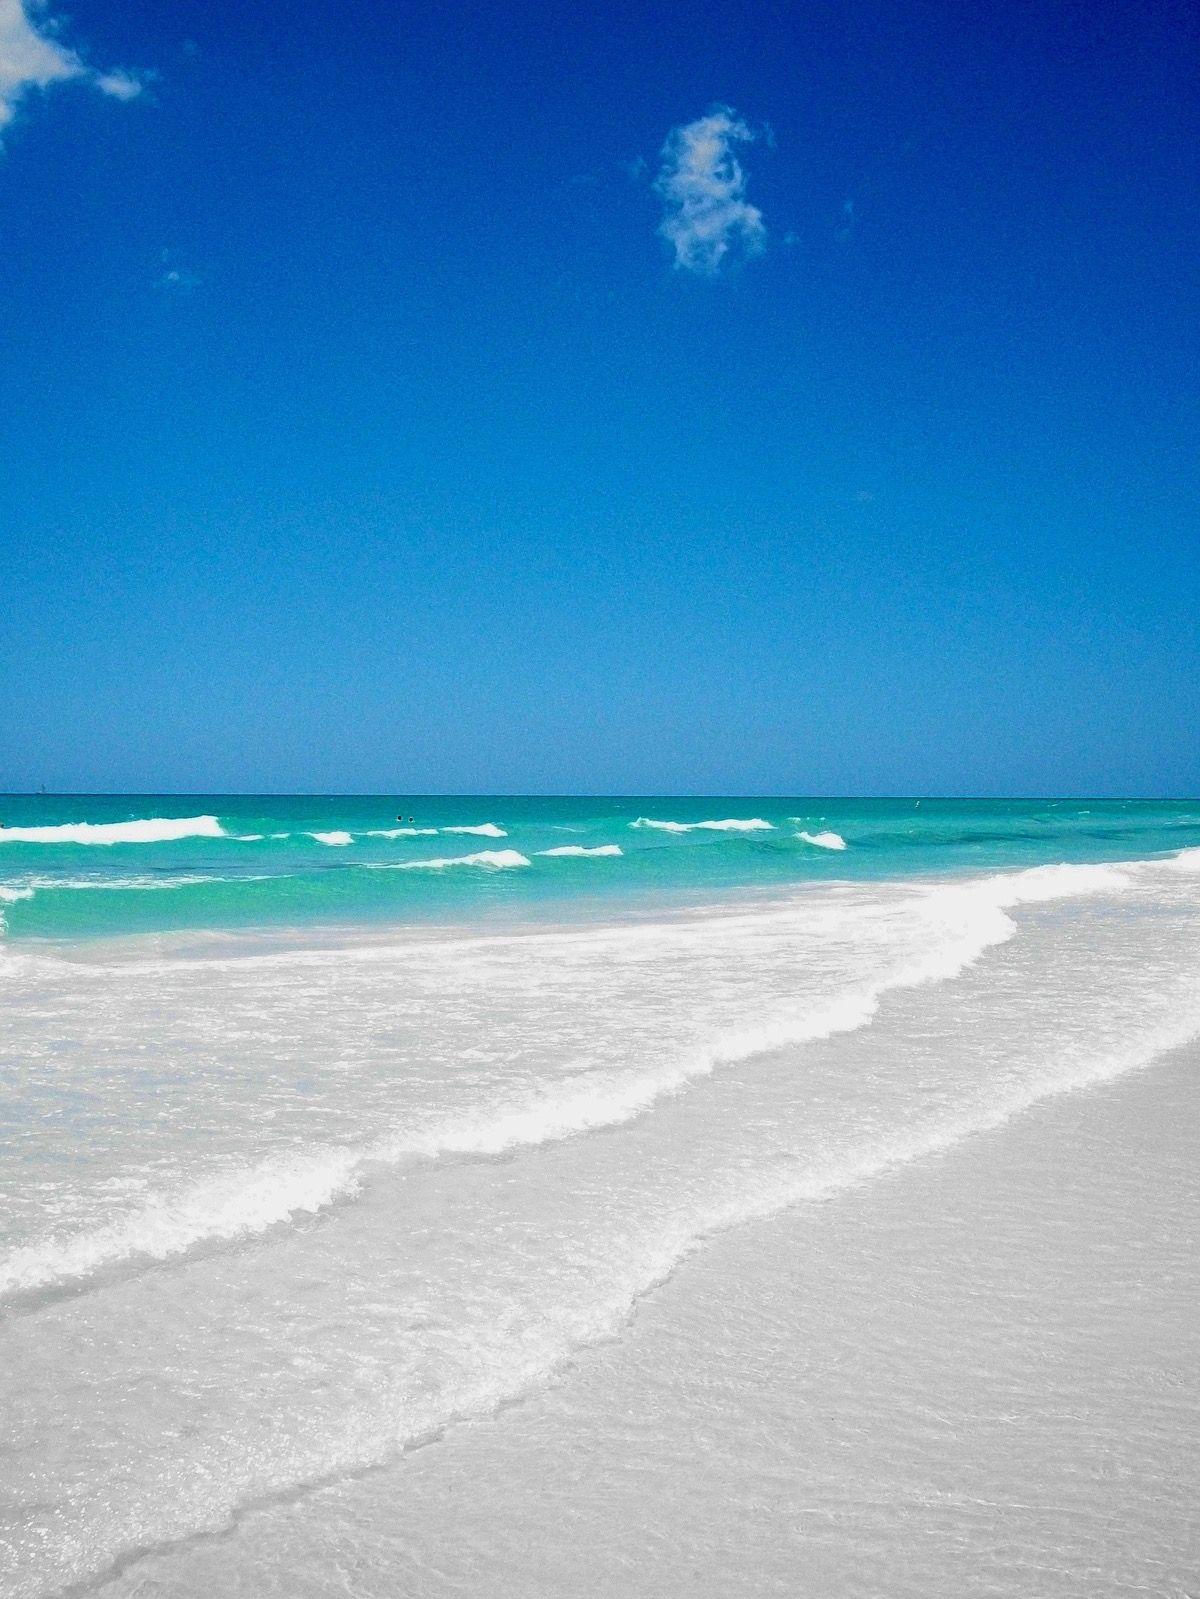 Pin By June Davenport On Beachy Keen Siesta Key Beach Sarasota Beach Siesta Key Florida